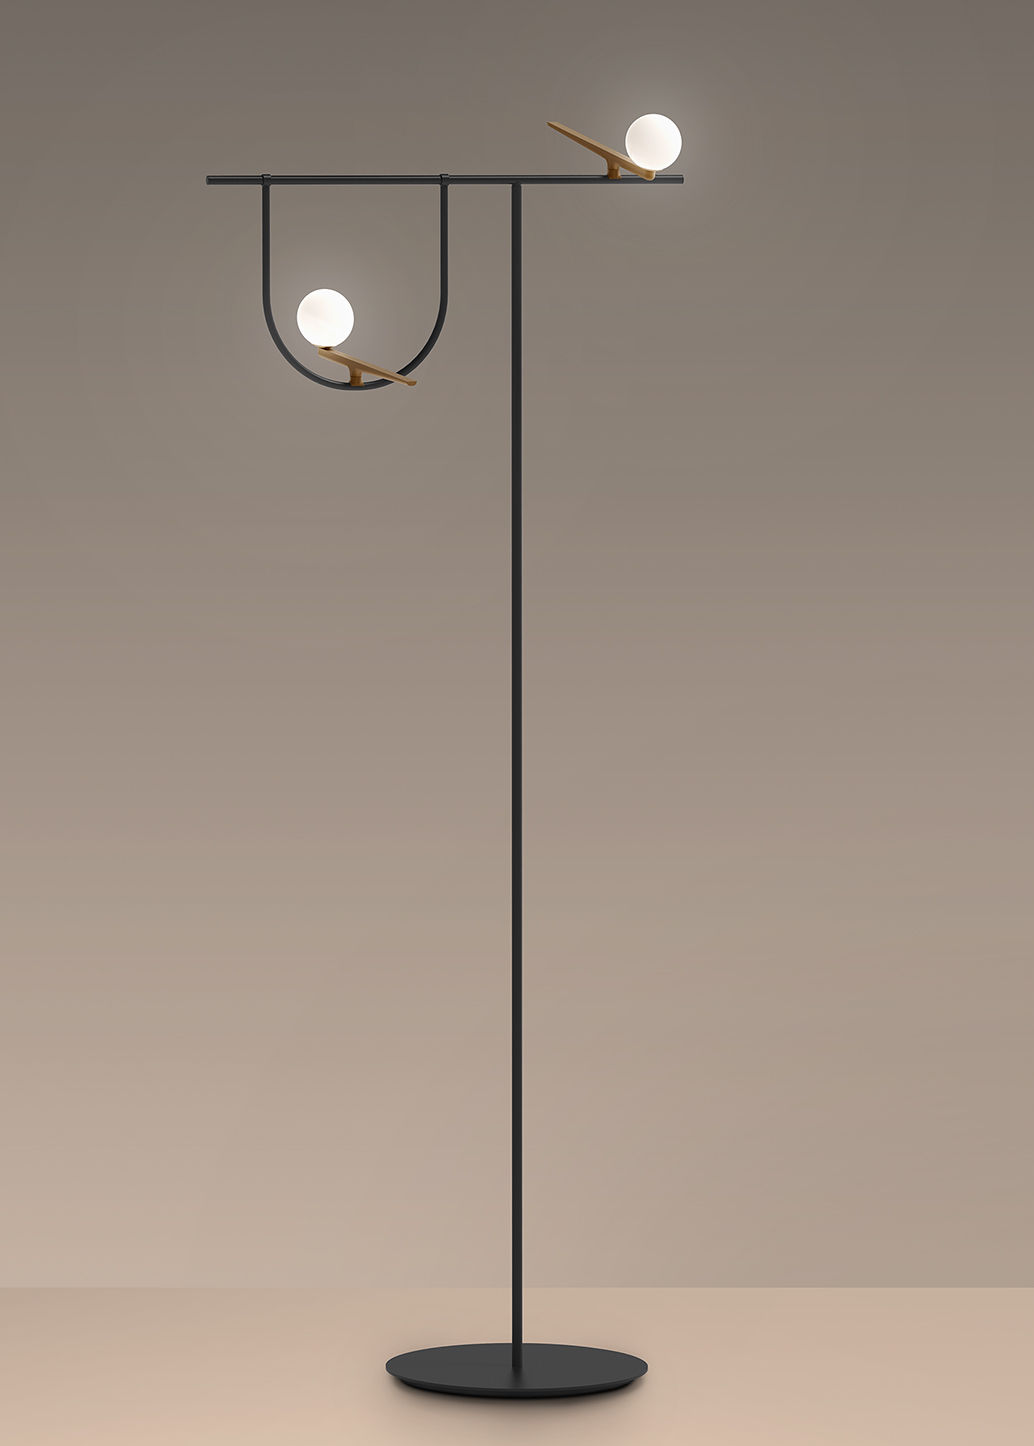 yanzi led stehleuchte messing glas schwarz messingfarben kugeln wei by artemide. Black Bedroom Furniture Sets. Home Design Ideas